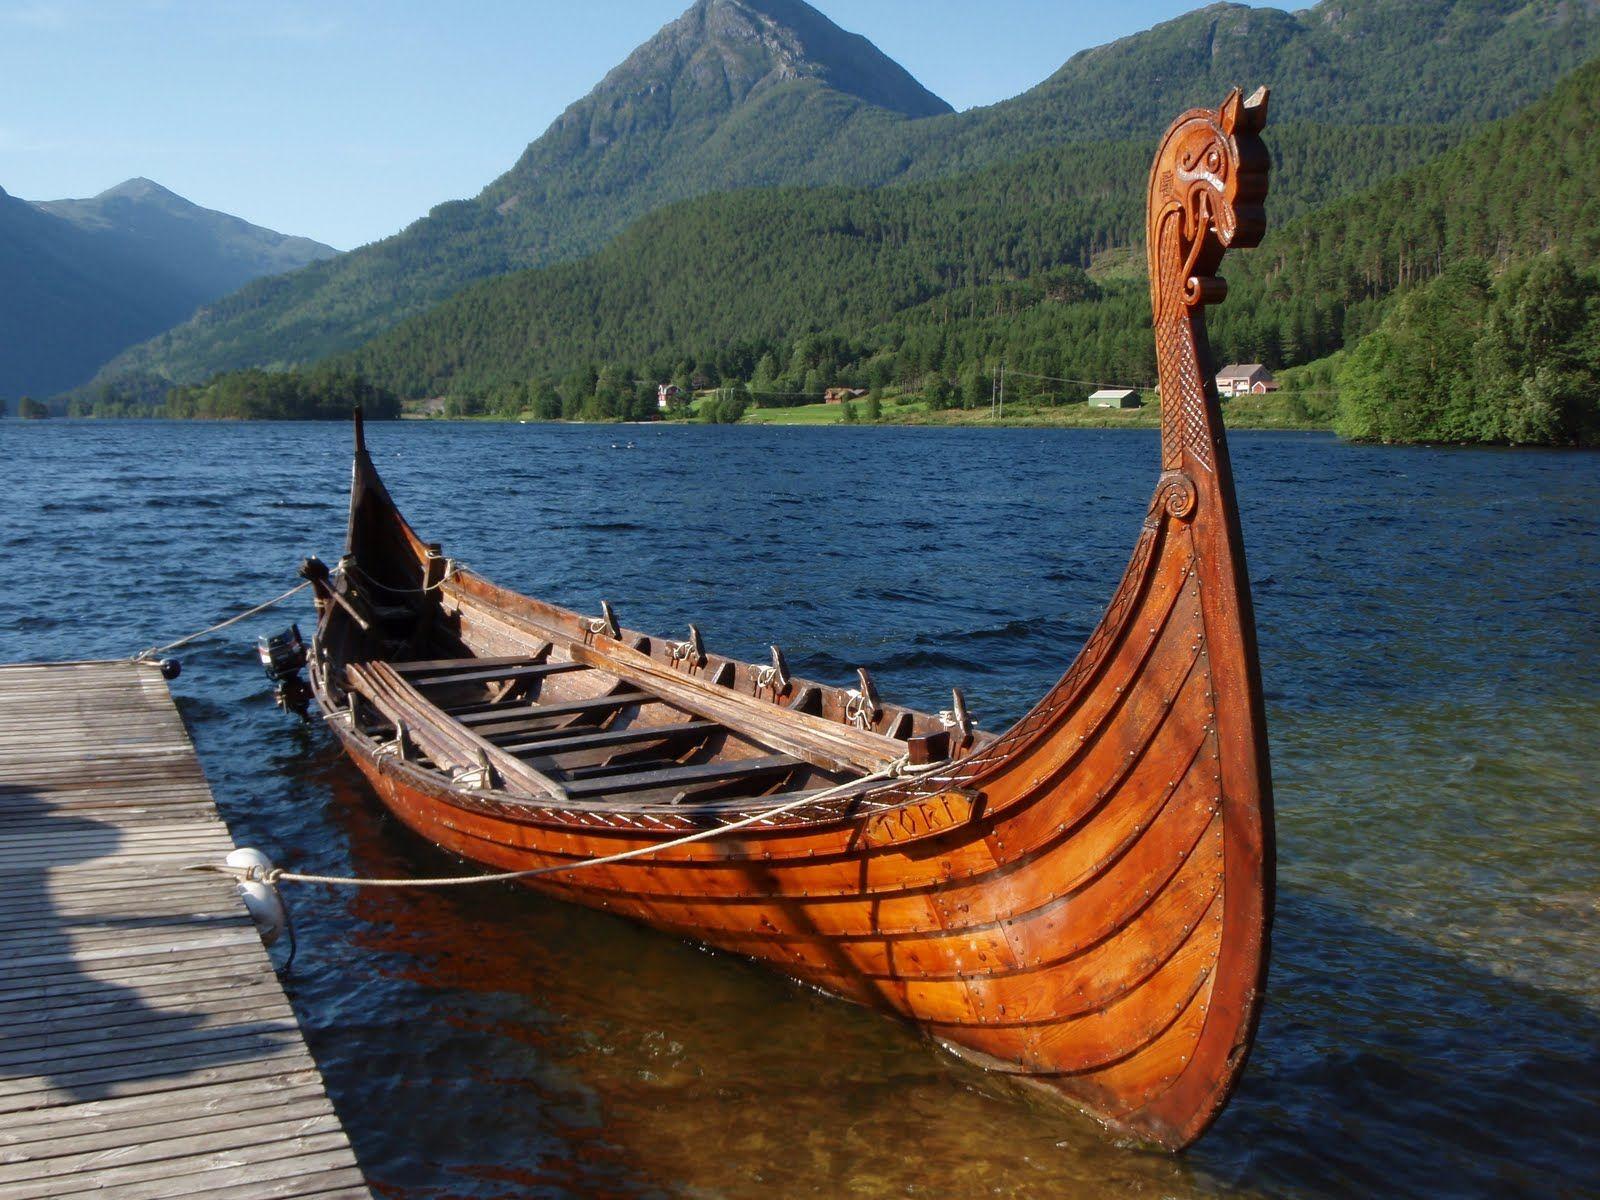 Wooden Boats General | Boats | Pinterest | Wooden boats, Vikings ...